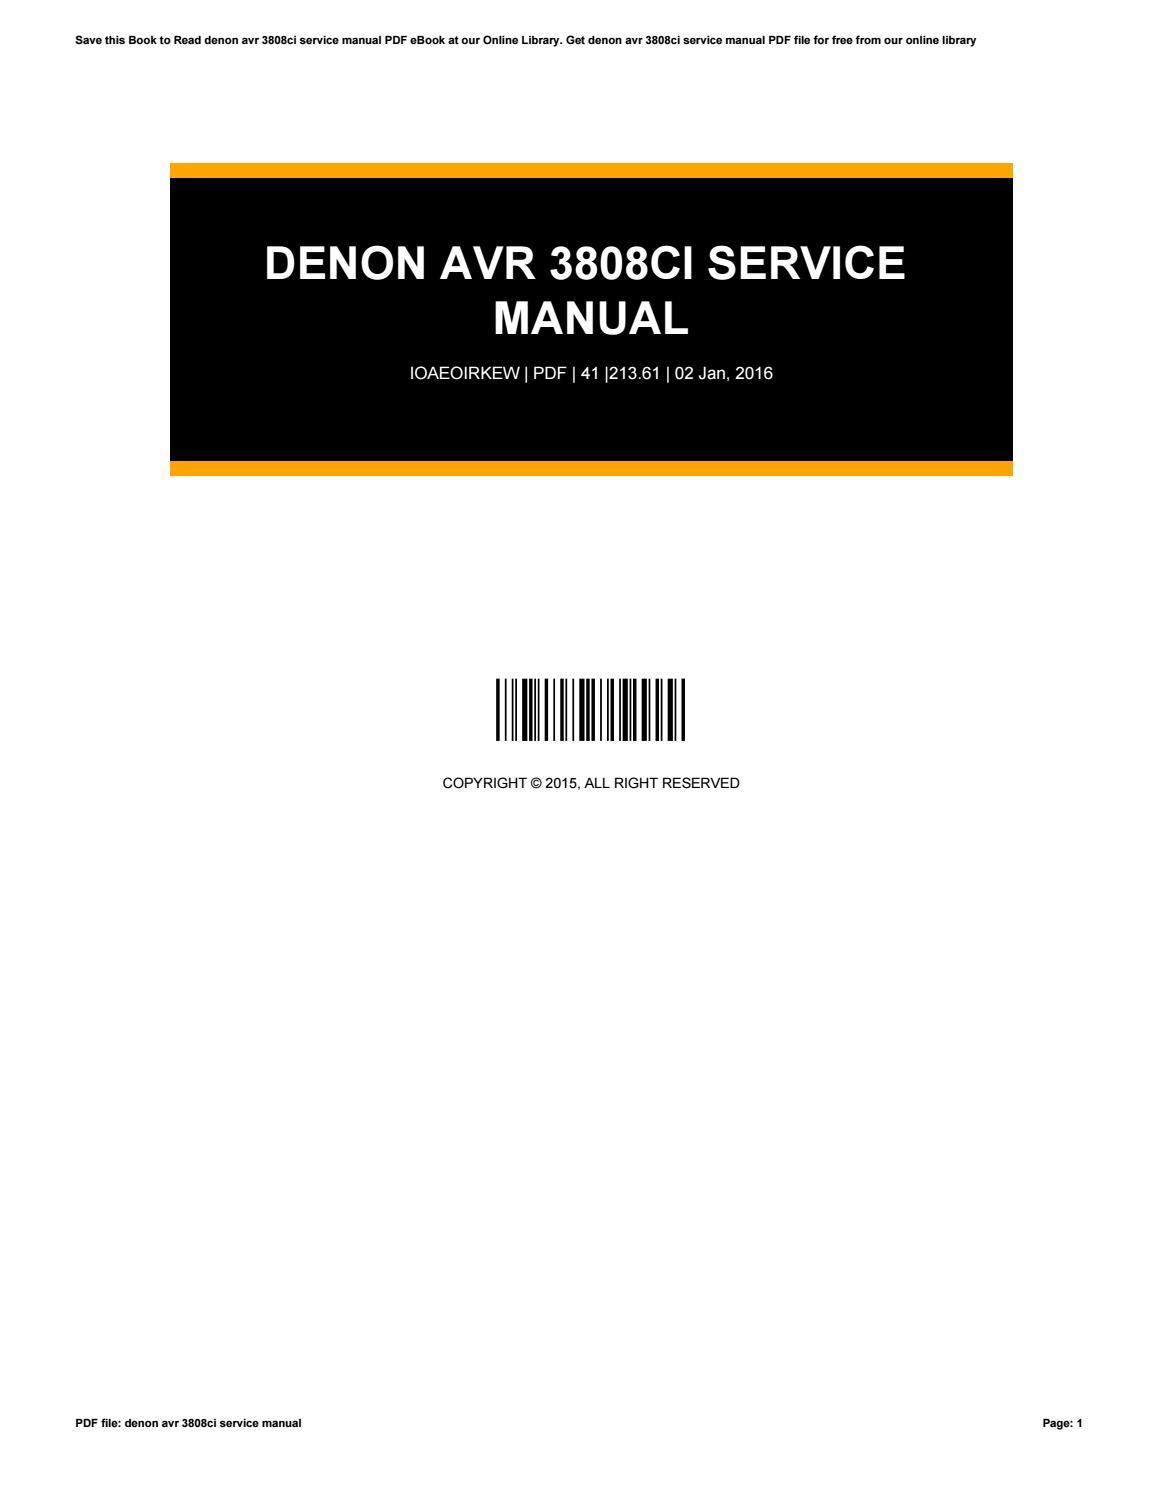 Denon avr 3808ci service manual by abilasa42lama issuu.